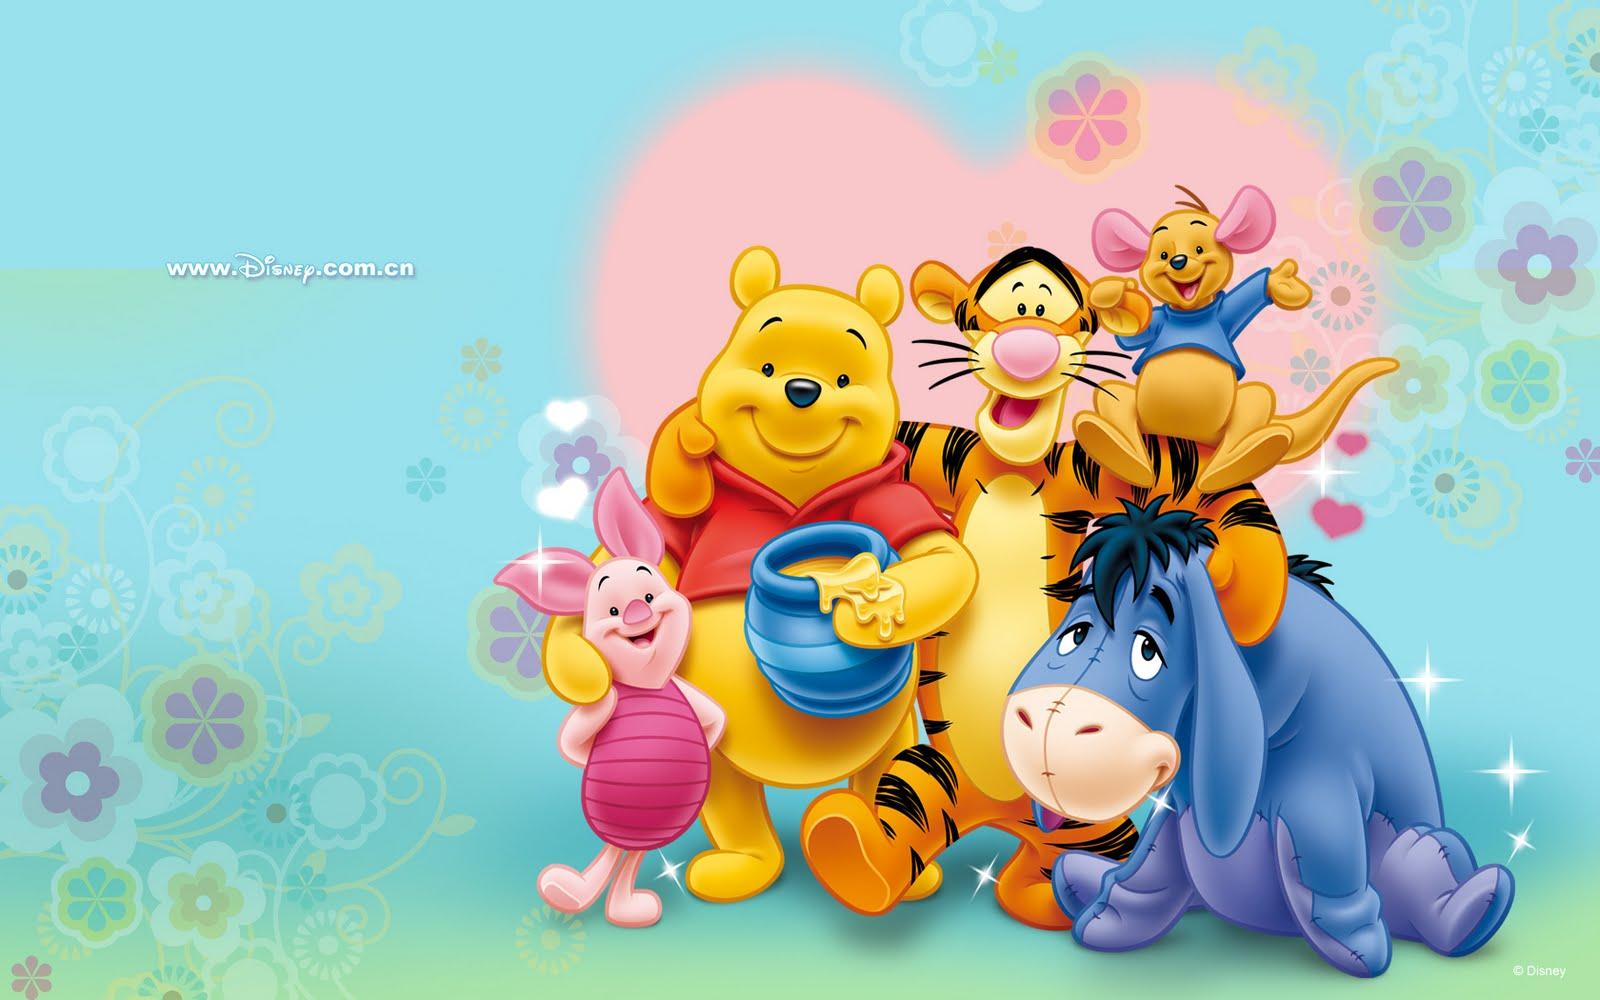 Imagenes De Amor De Winnie Pooh